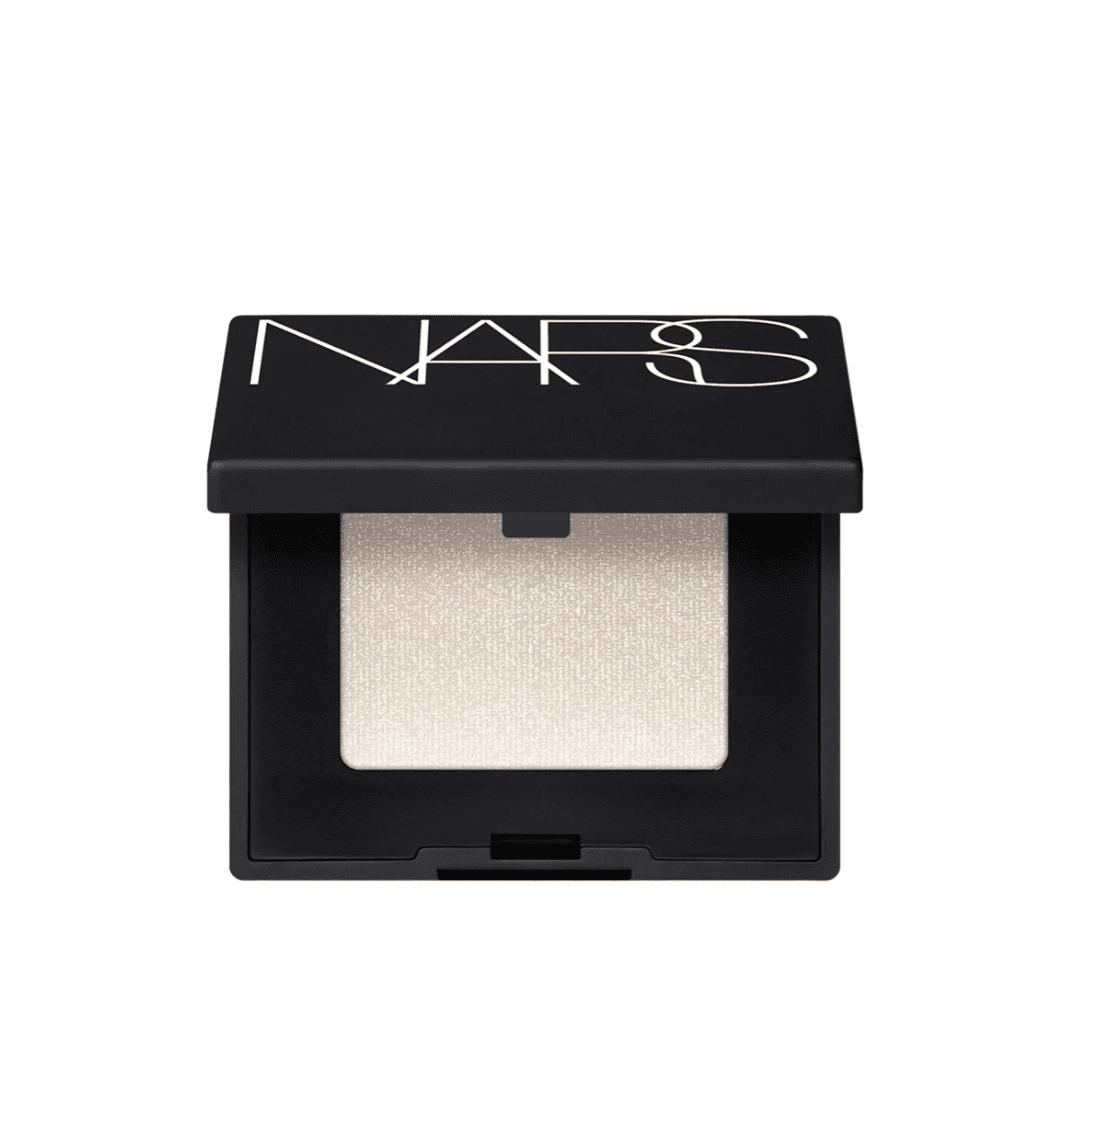 NARS Precious Metals Single Eyeshadow - New Year's Eve Makeup